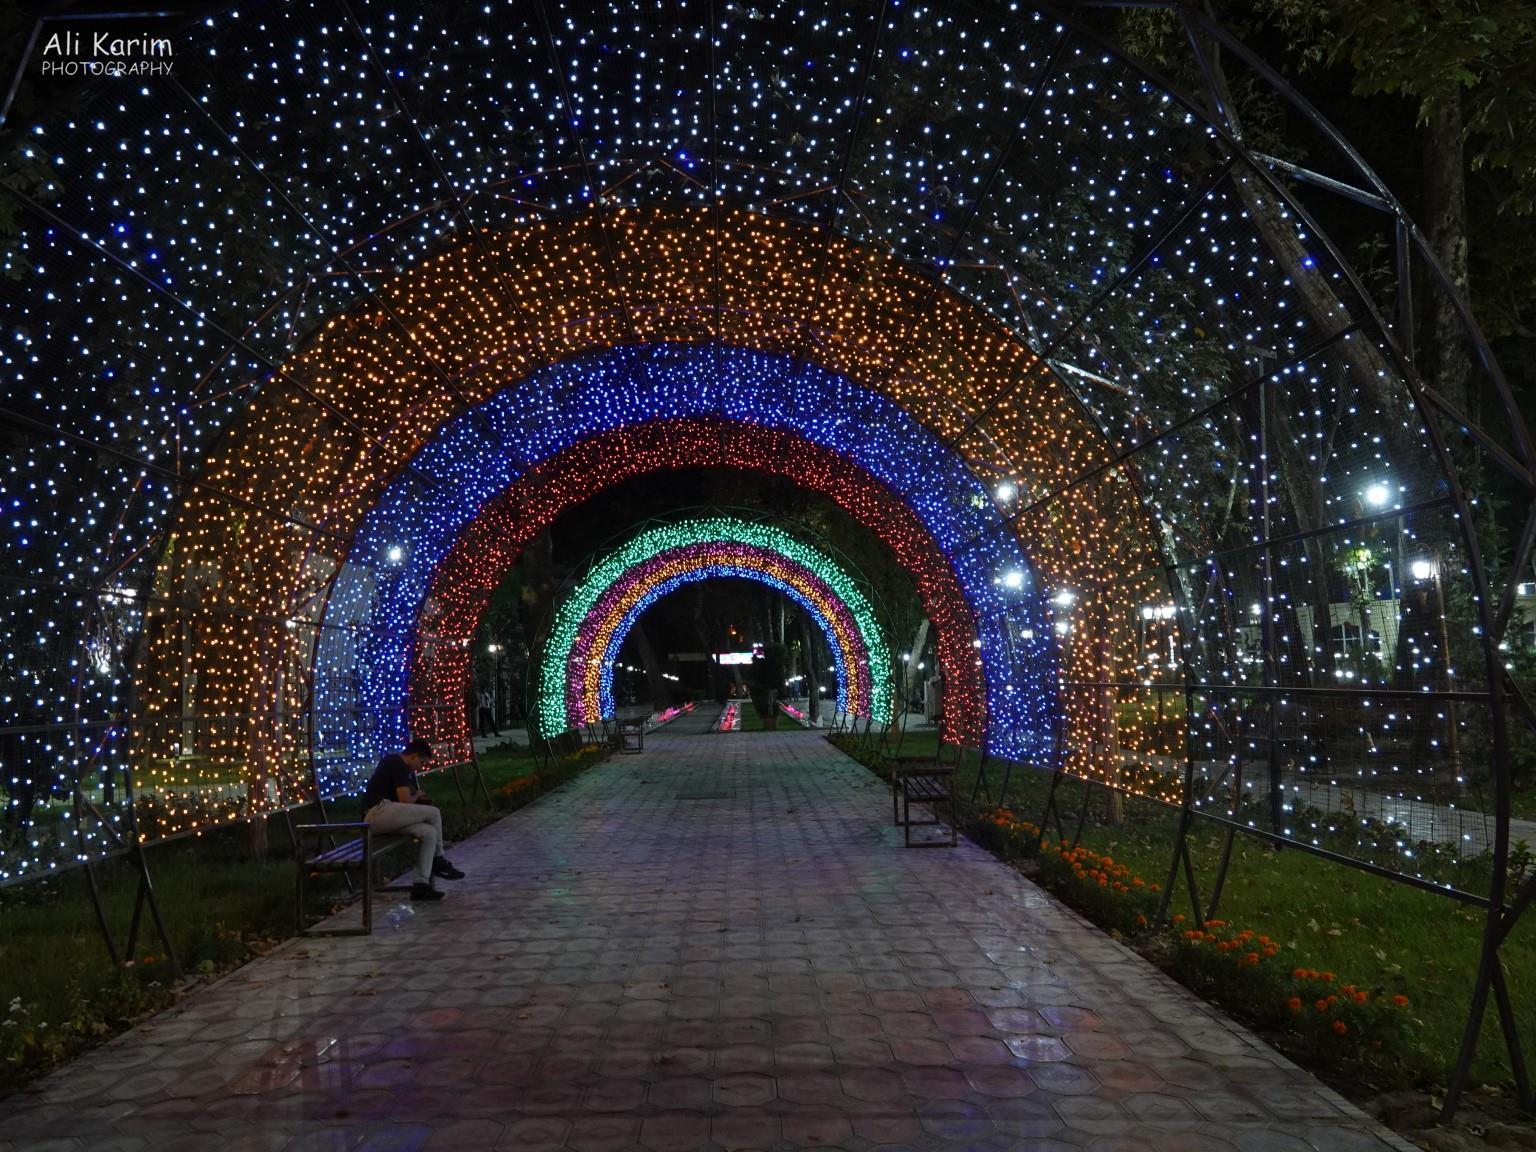 Dushanbe, Tajikistan Interesting walkway in a Park